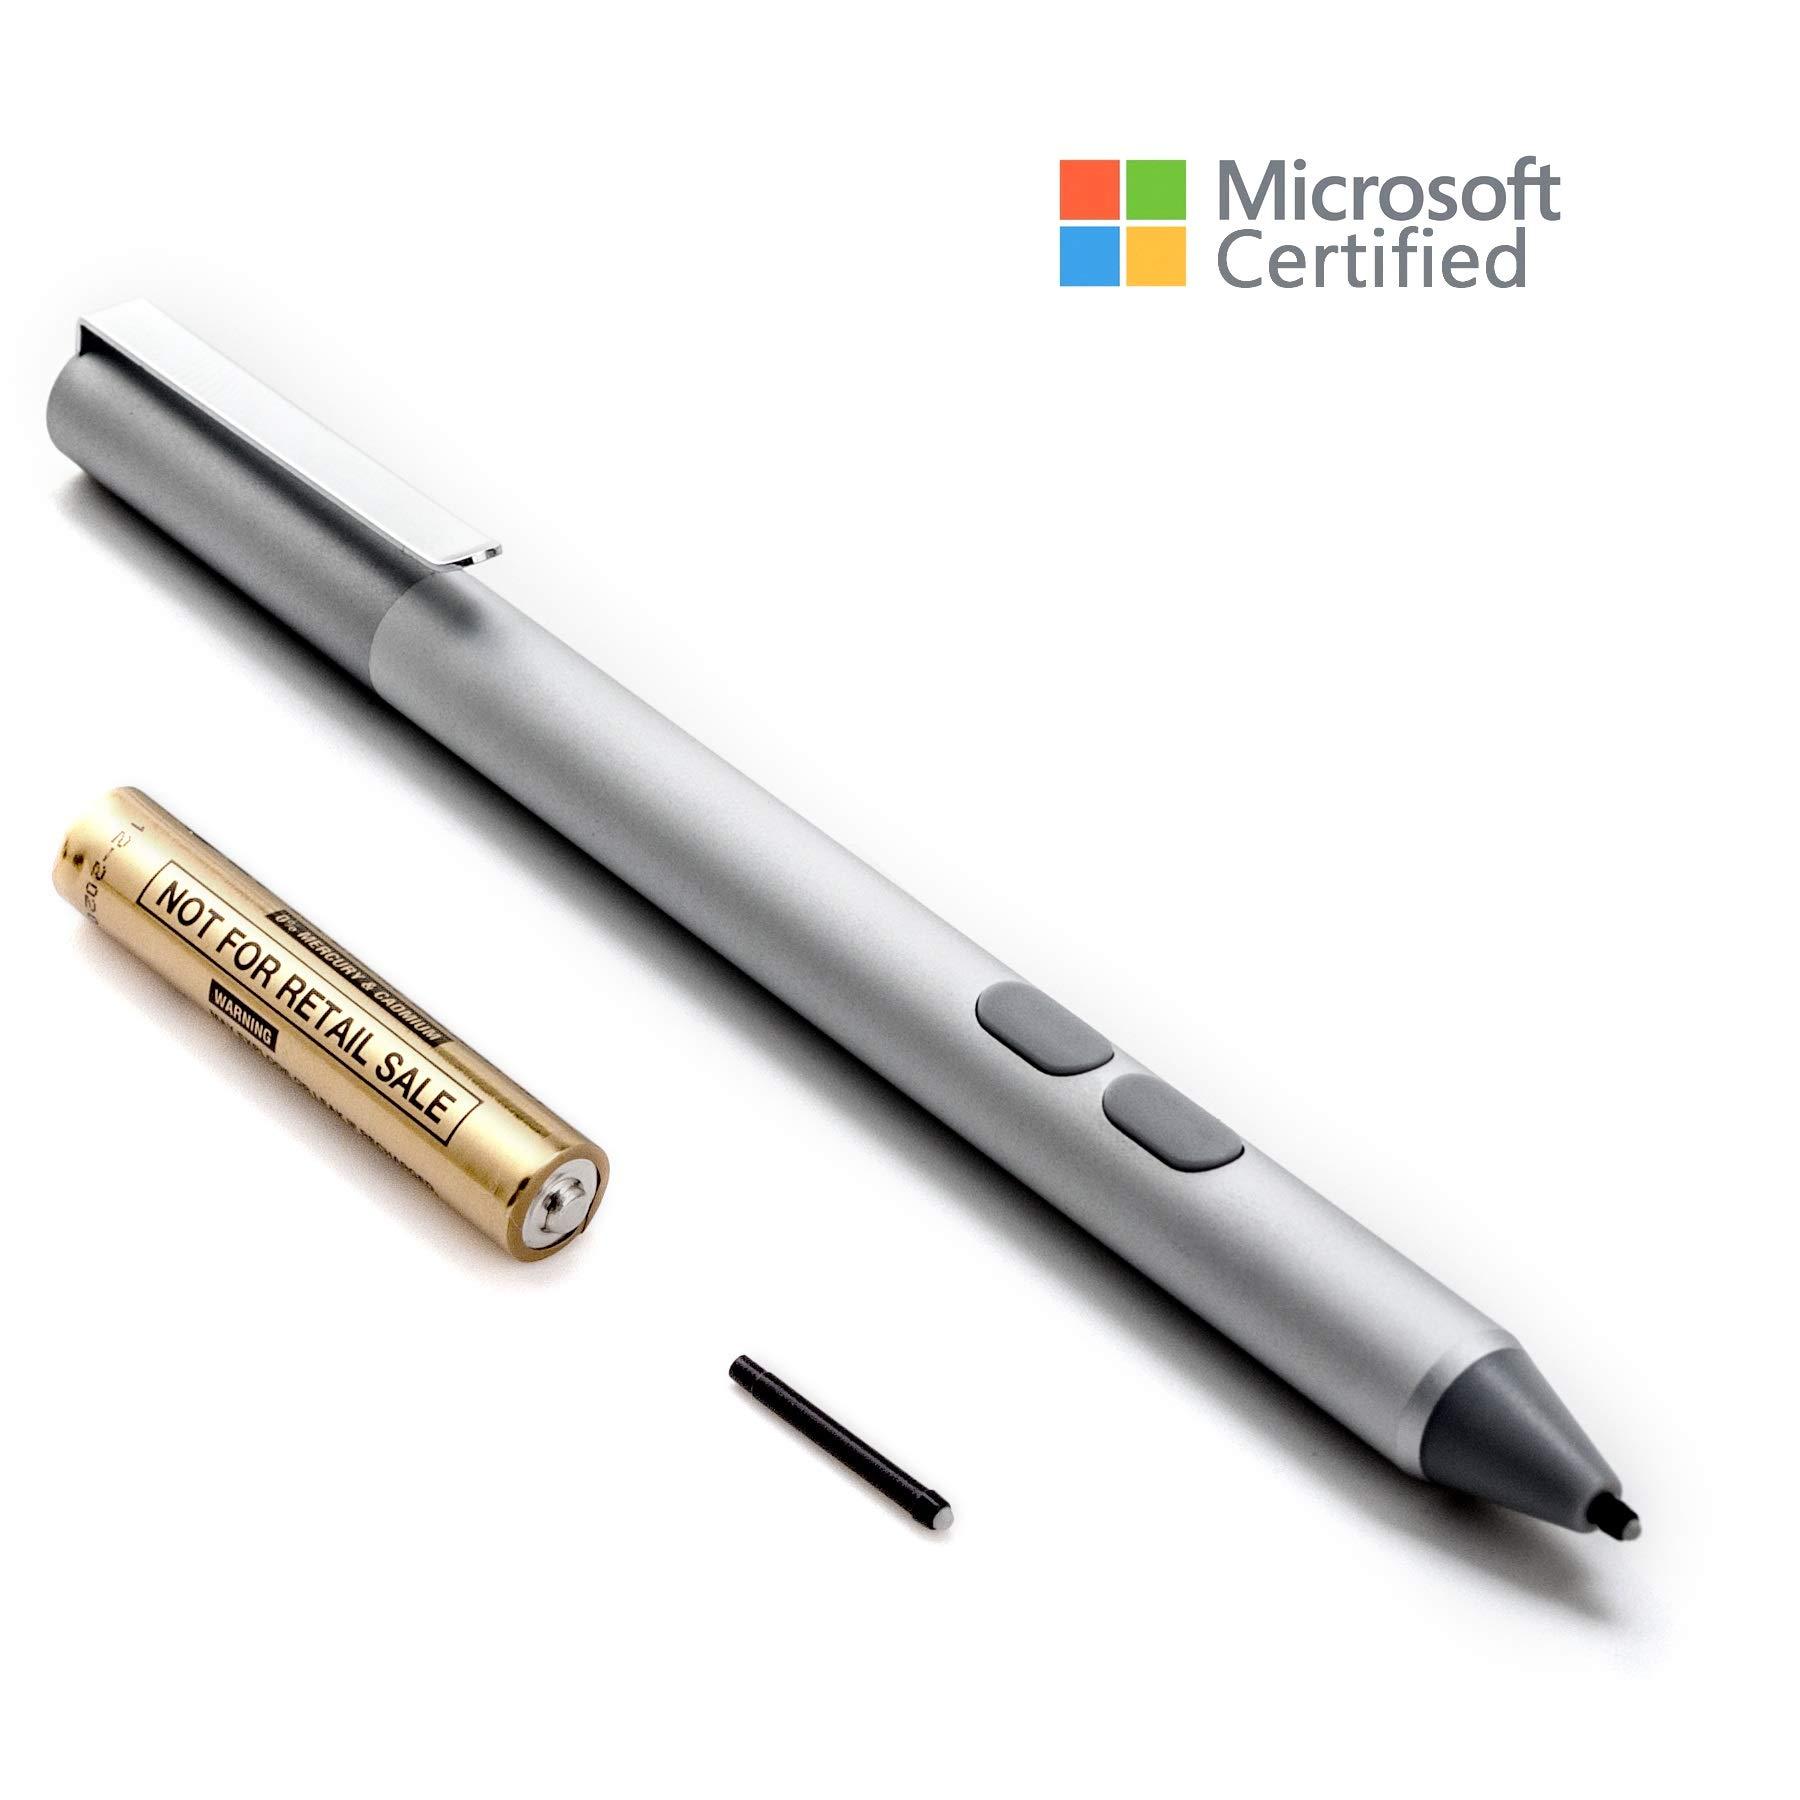 Surface Pen Microsoft Certified, Aluminium Body 4096 Pressure Sensitivity, 2 Soft Nibs for Microsoft Surface 3/4/5/6, Surface Pro 3/ Pro 4/Pro 6/Pro(2017), Surface Book, Surface Laptop/Studio (Silver)